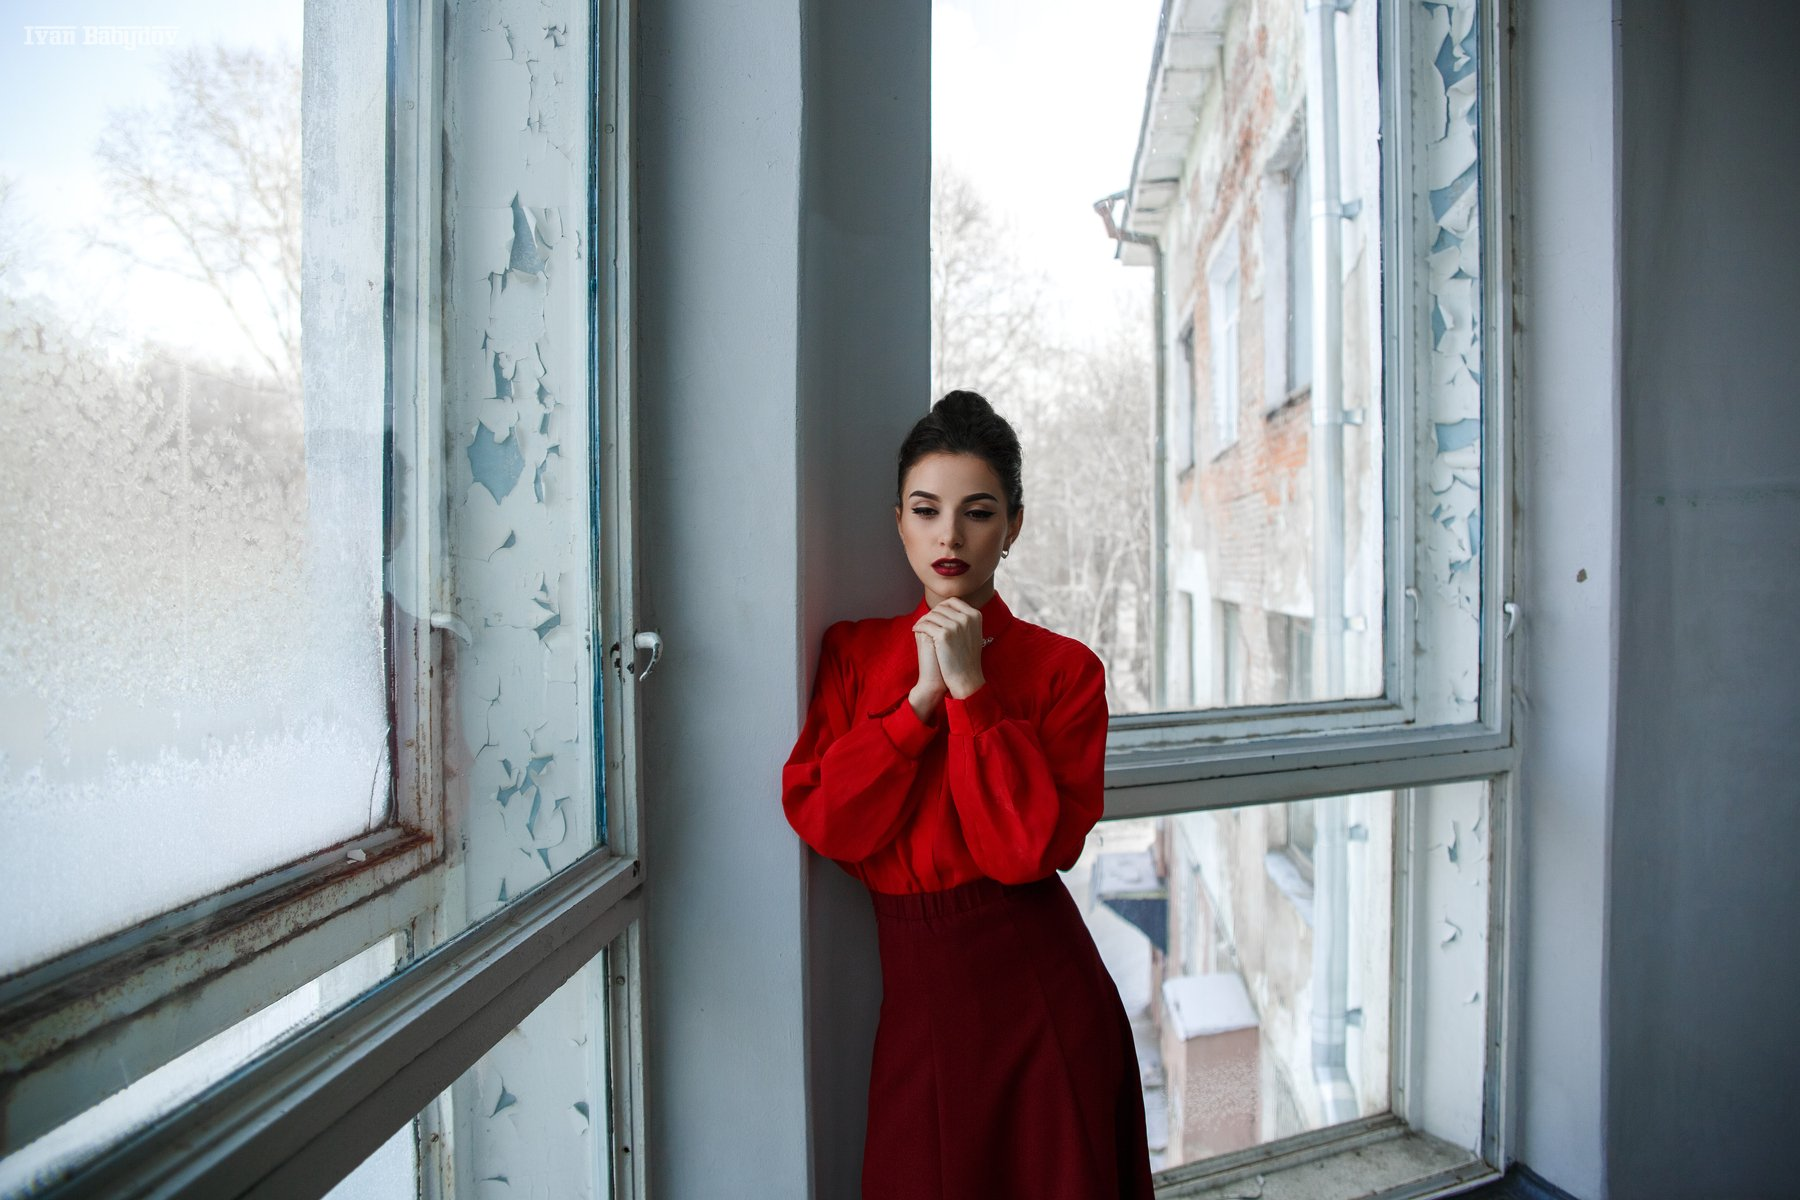 #ivanBabydov #girl #red #face #lady, Бабыдов Иван